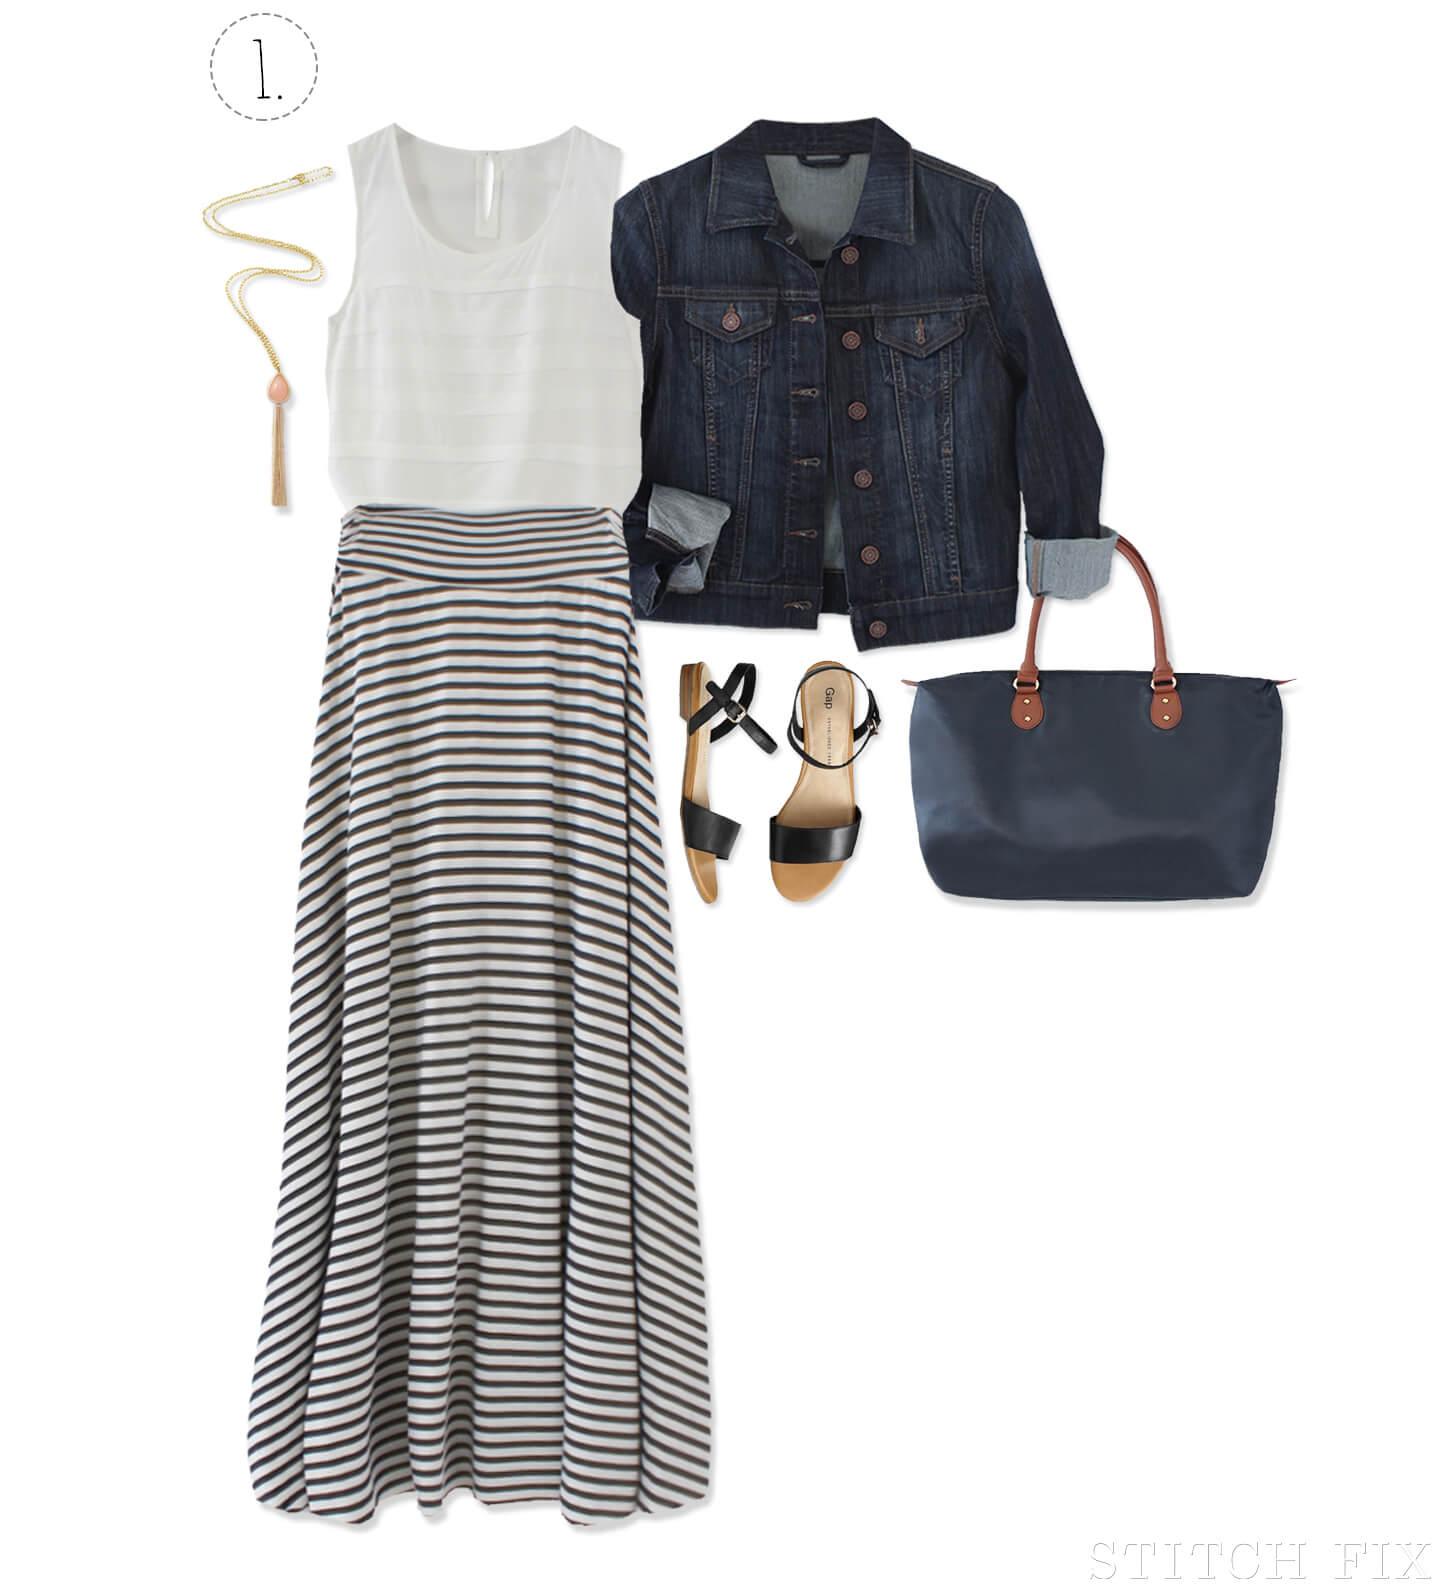 The Weekend Getaway Maxi Skirt